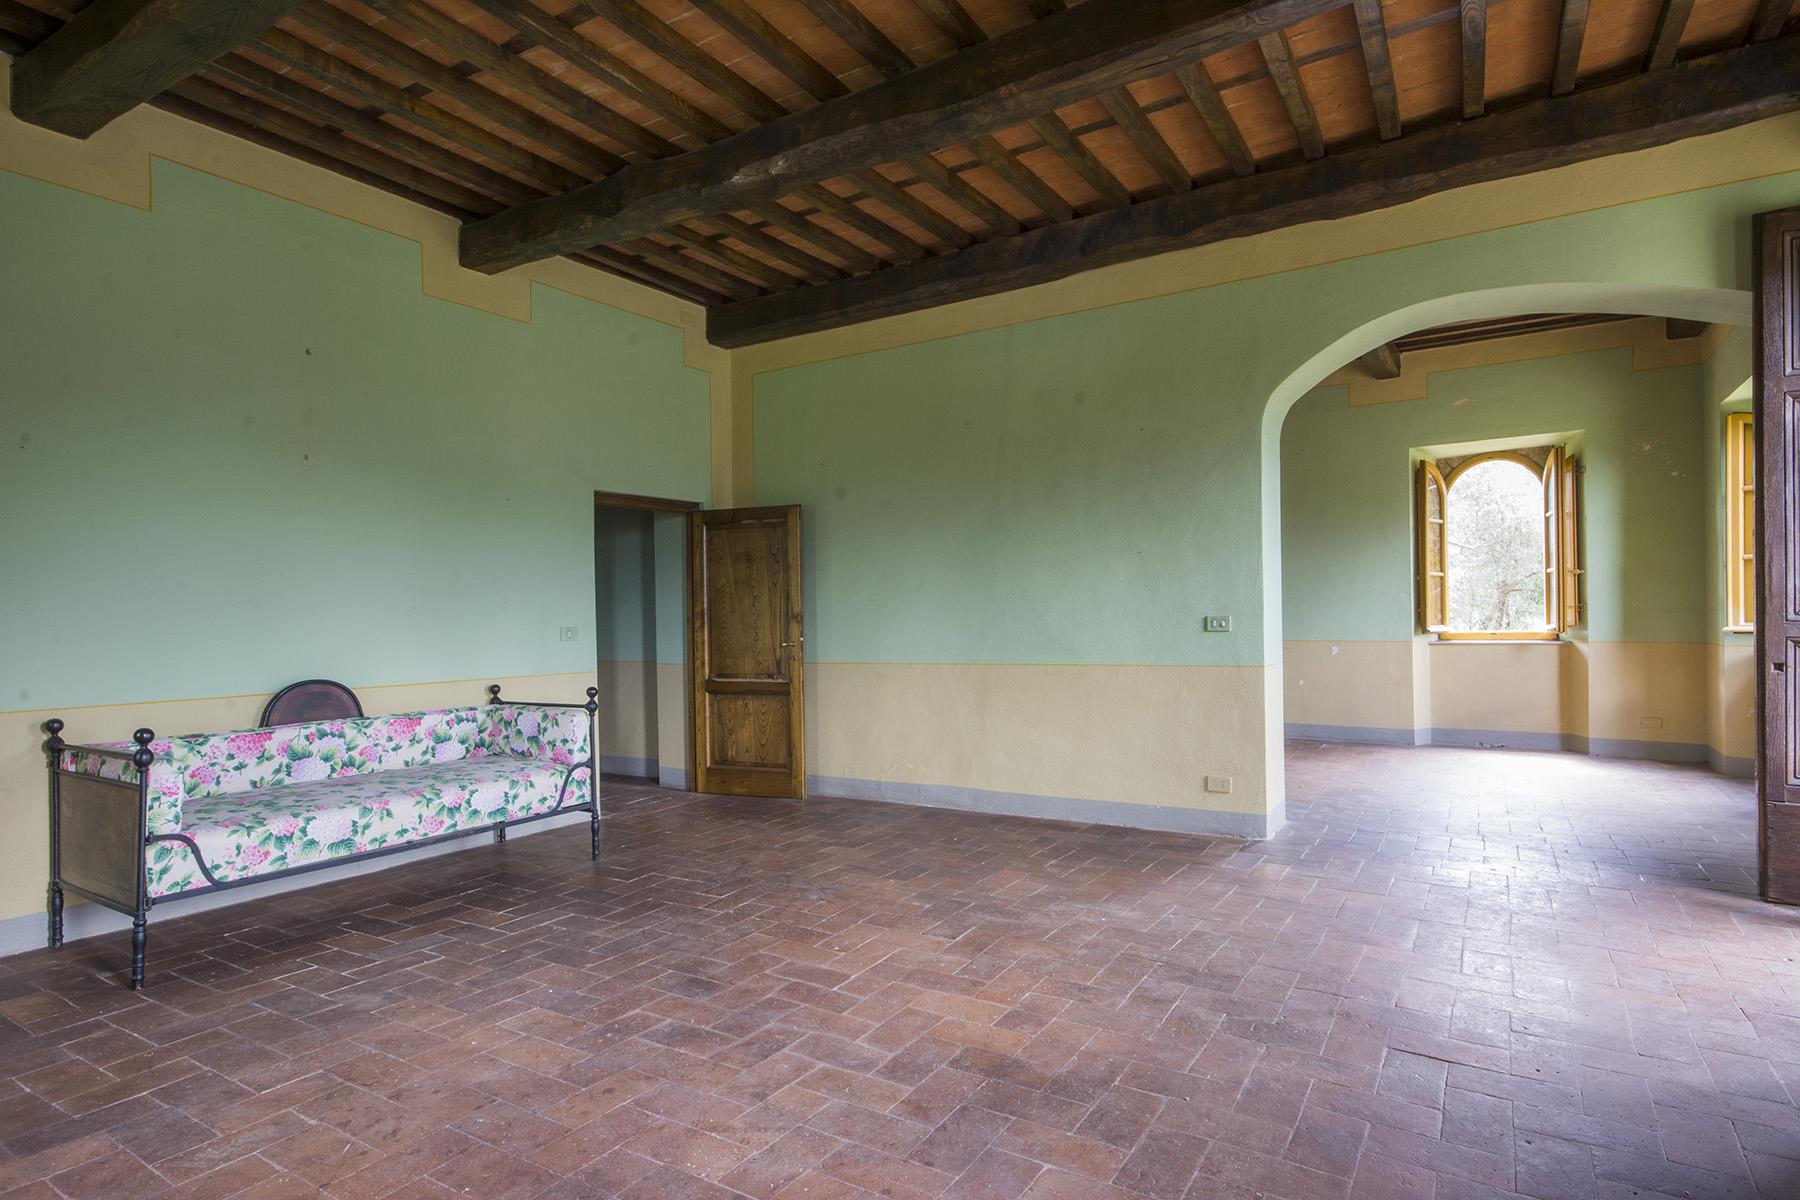 Villa in Vendita a Capannori: 5 locali, 490 mq - Foto 4